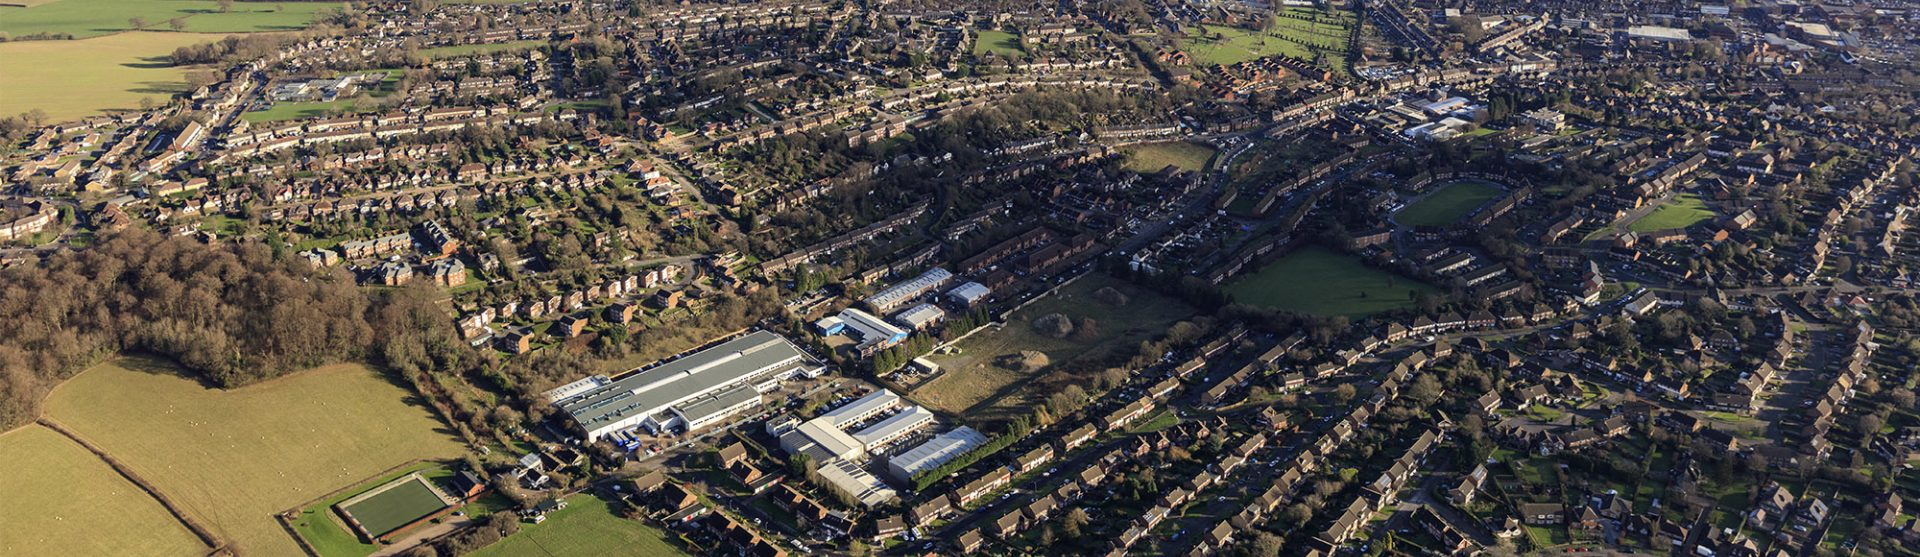 Chesham United Kingdom  city photos : Home / Projects / Community Planning Projects / Asheridge Road /